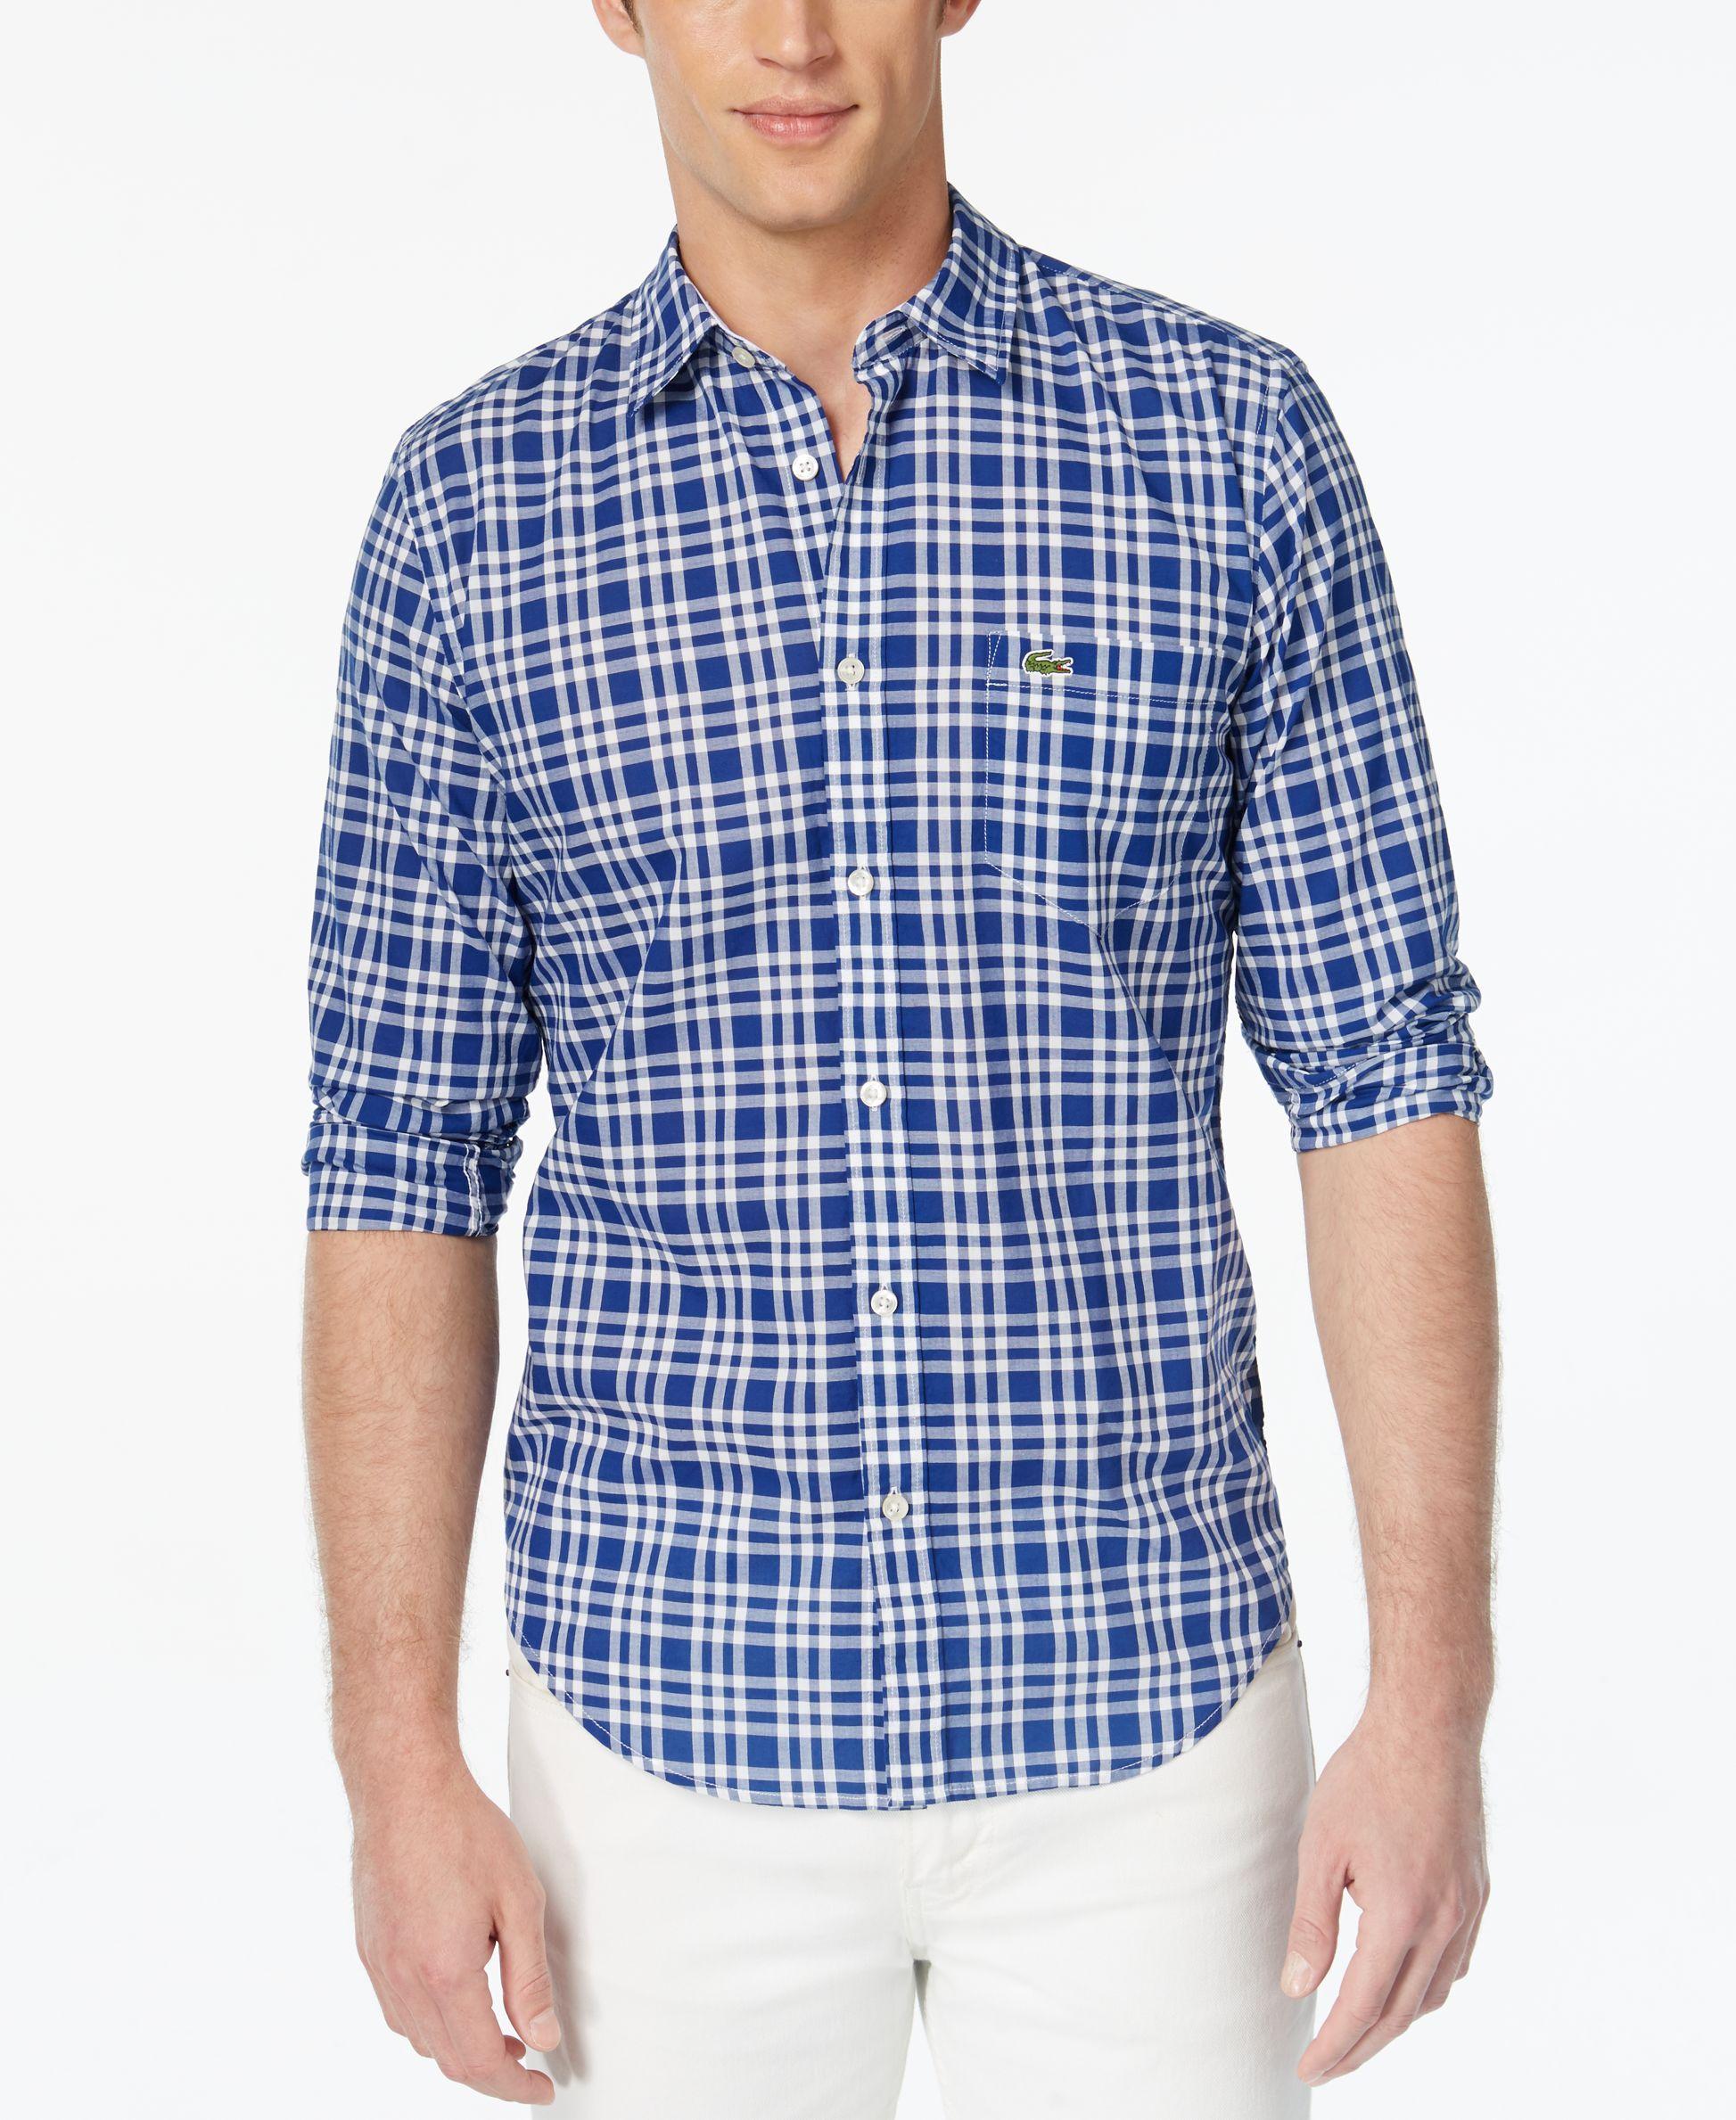 Lacoste Men S Check Poplin Long Sleeve Shirt Casual Button Down